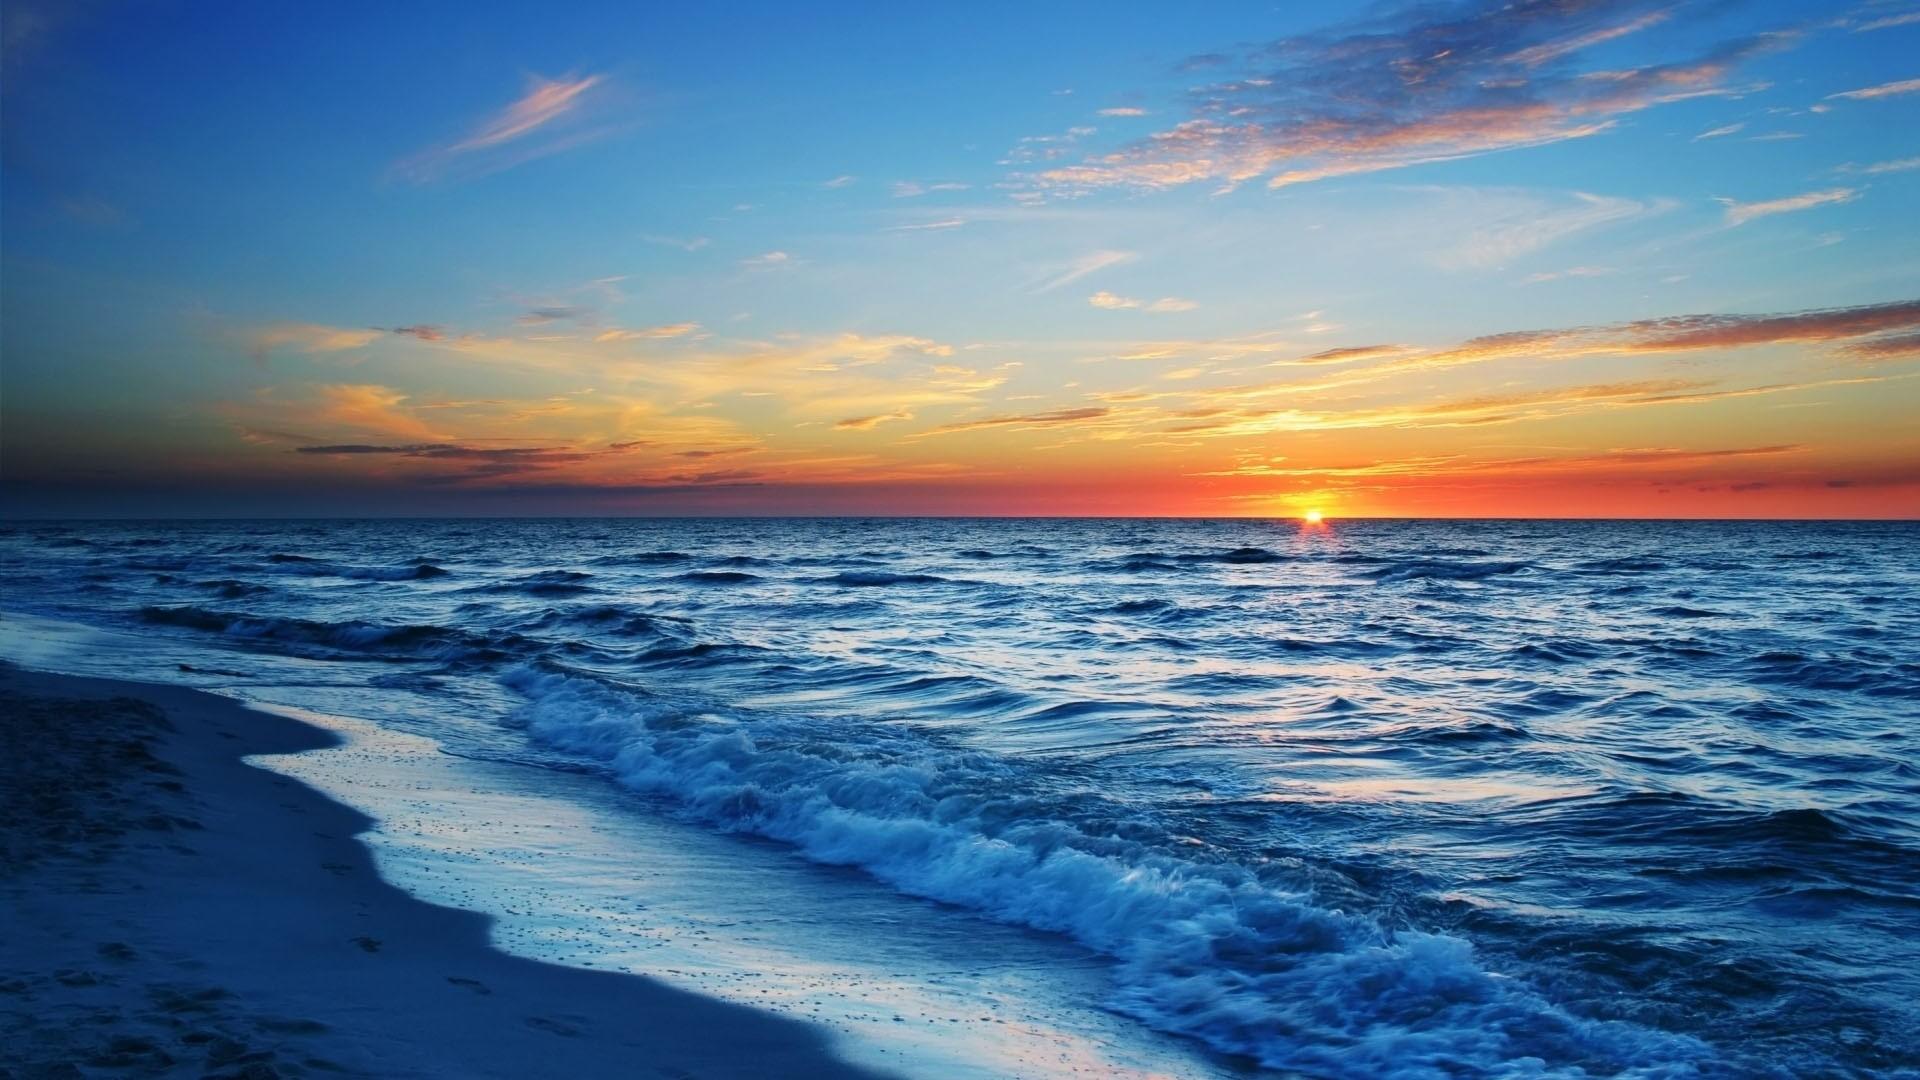 Sea wallpaper photo hd